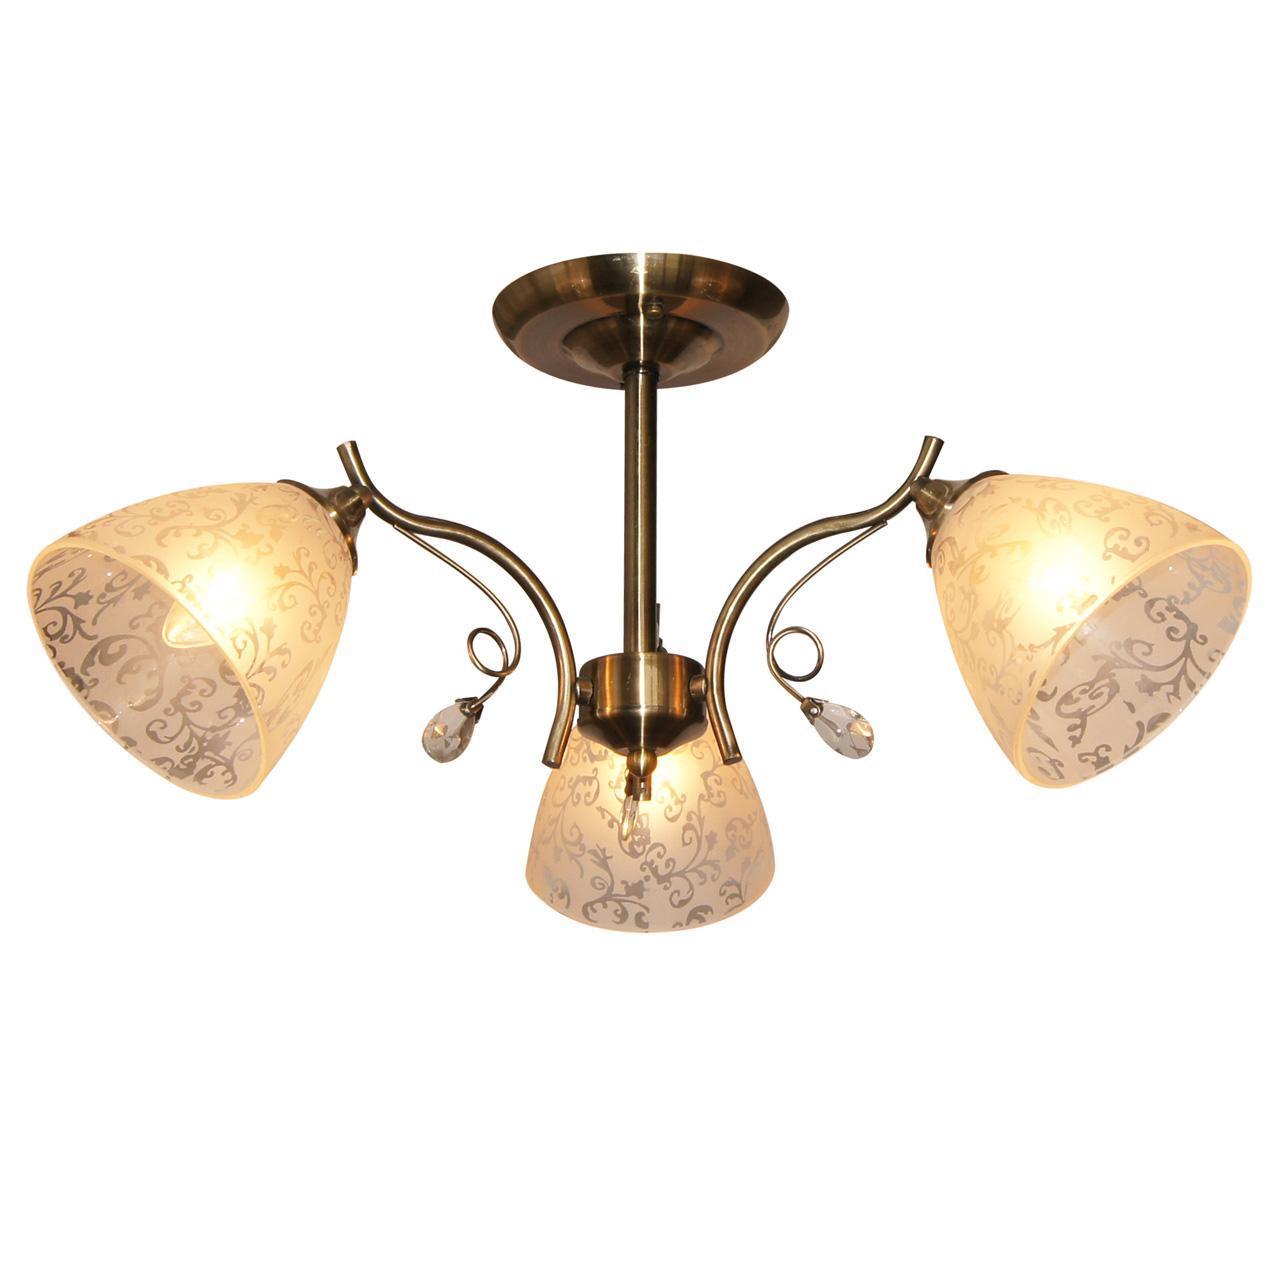 Люстра IDLamp Orebella 852/3PF-Oldbronze потолочная потолочная люстра id lamp boulder 244 3pf oldbronze